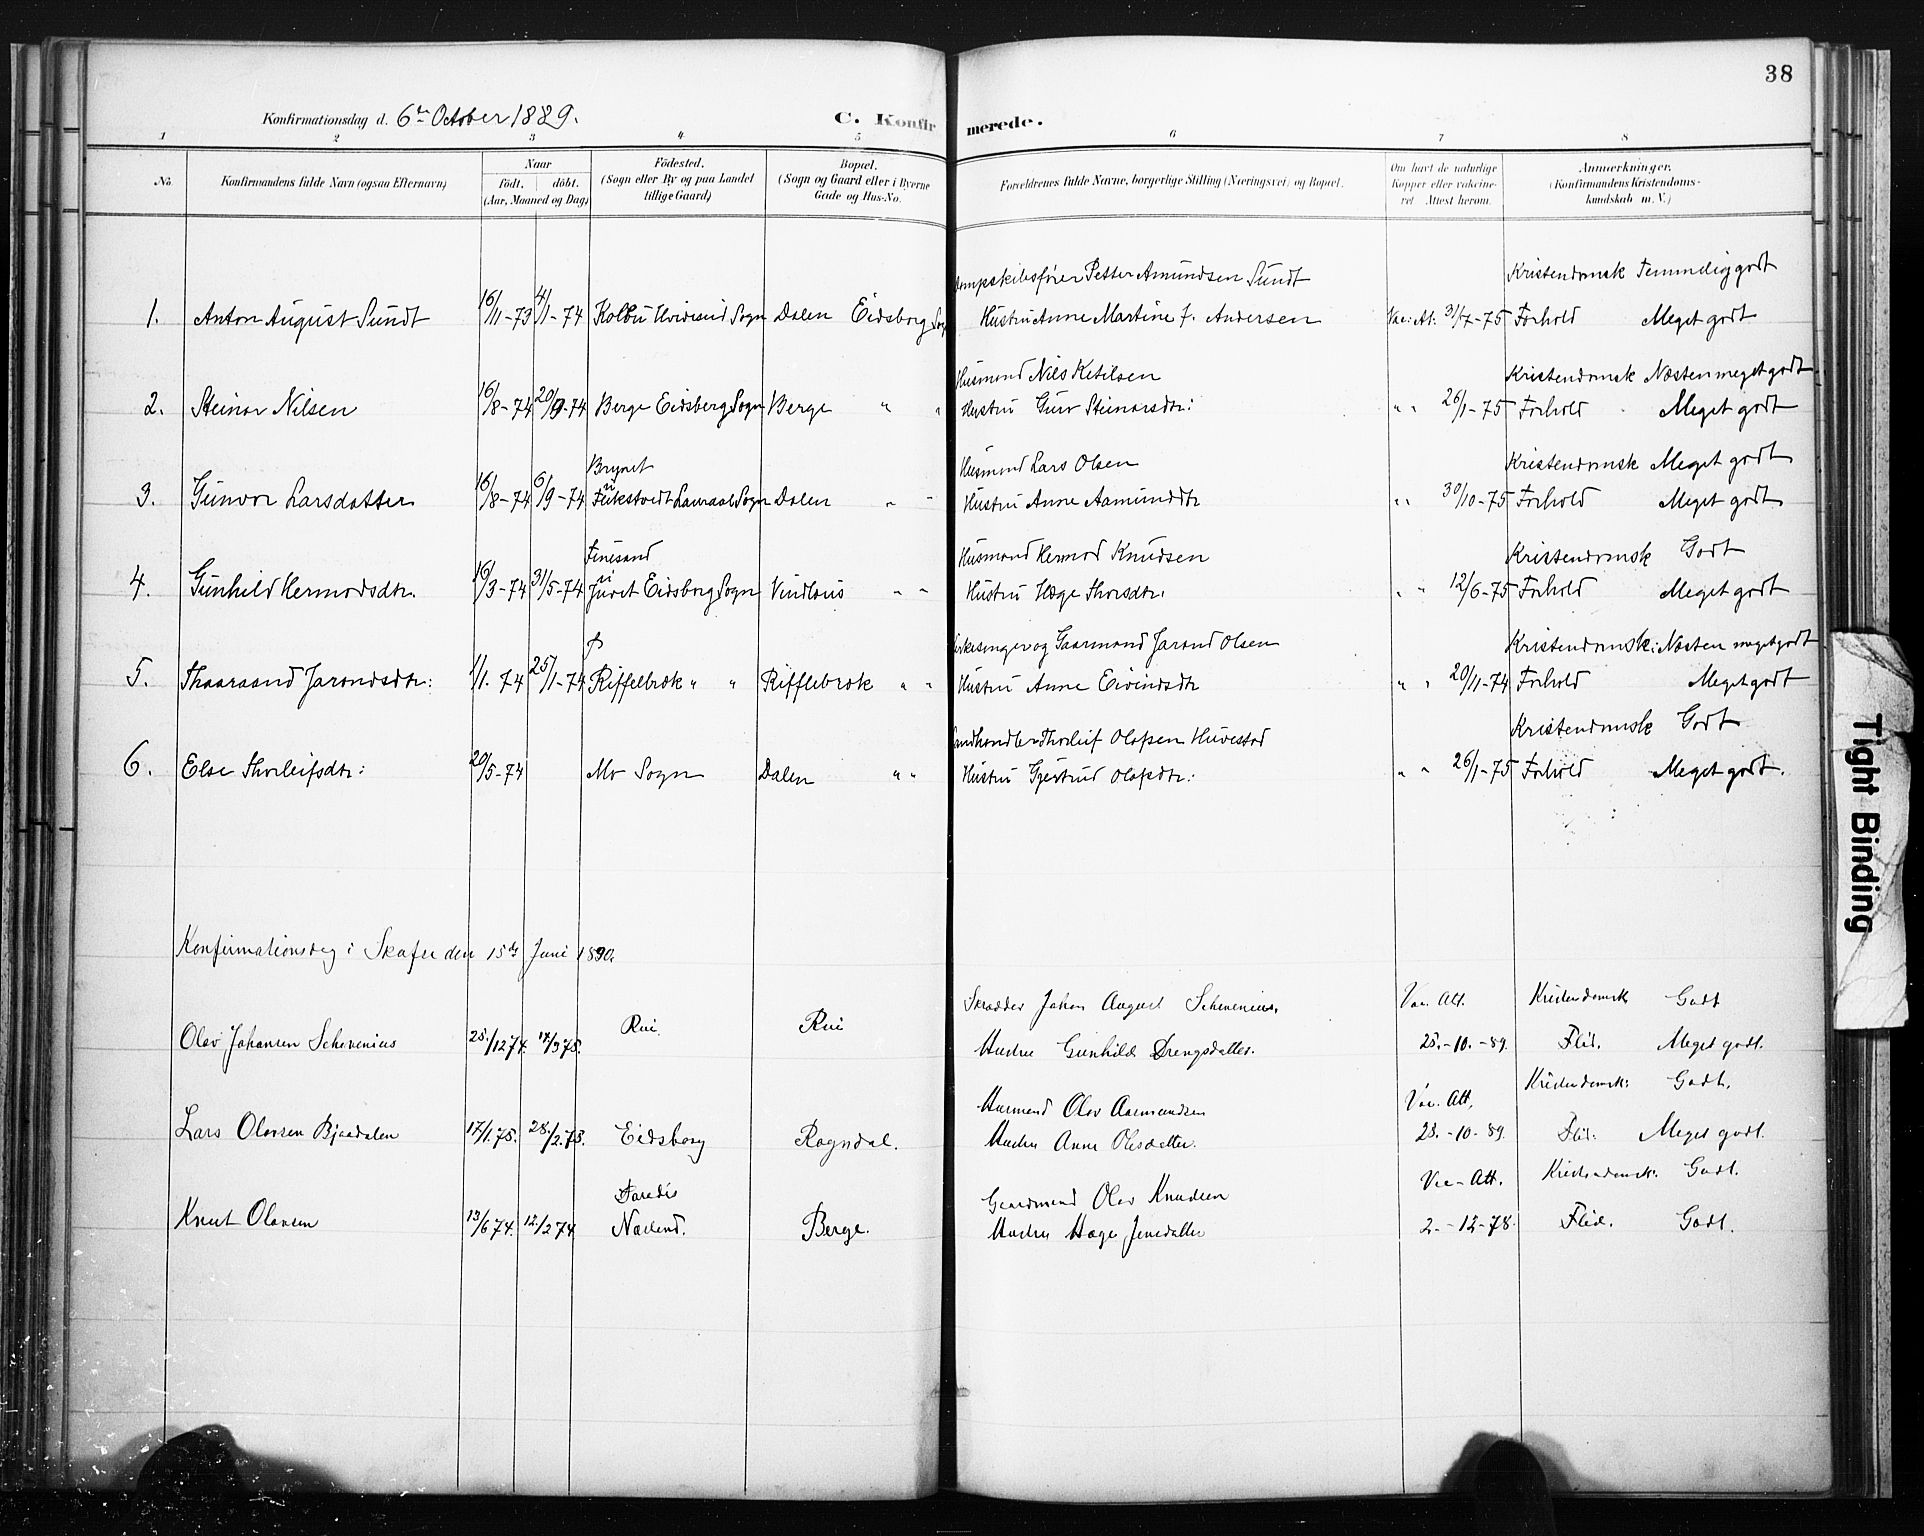 SAKO, Lårdal kirkebøker, F/Fb/L0002: Ministerialbok nr. II 2, 1887-1918, s. 38